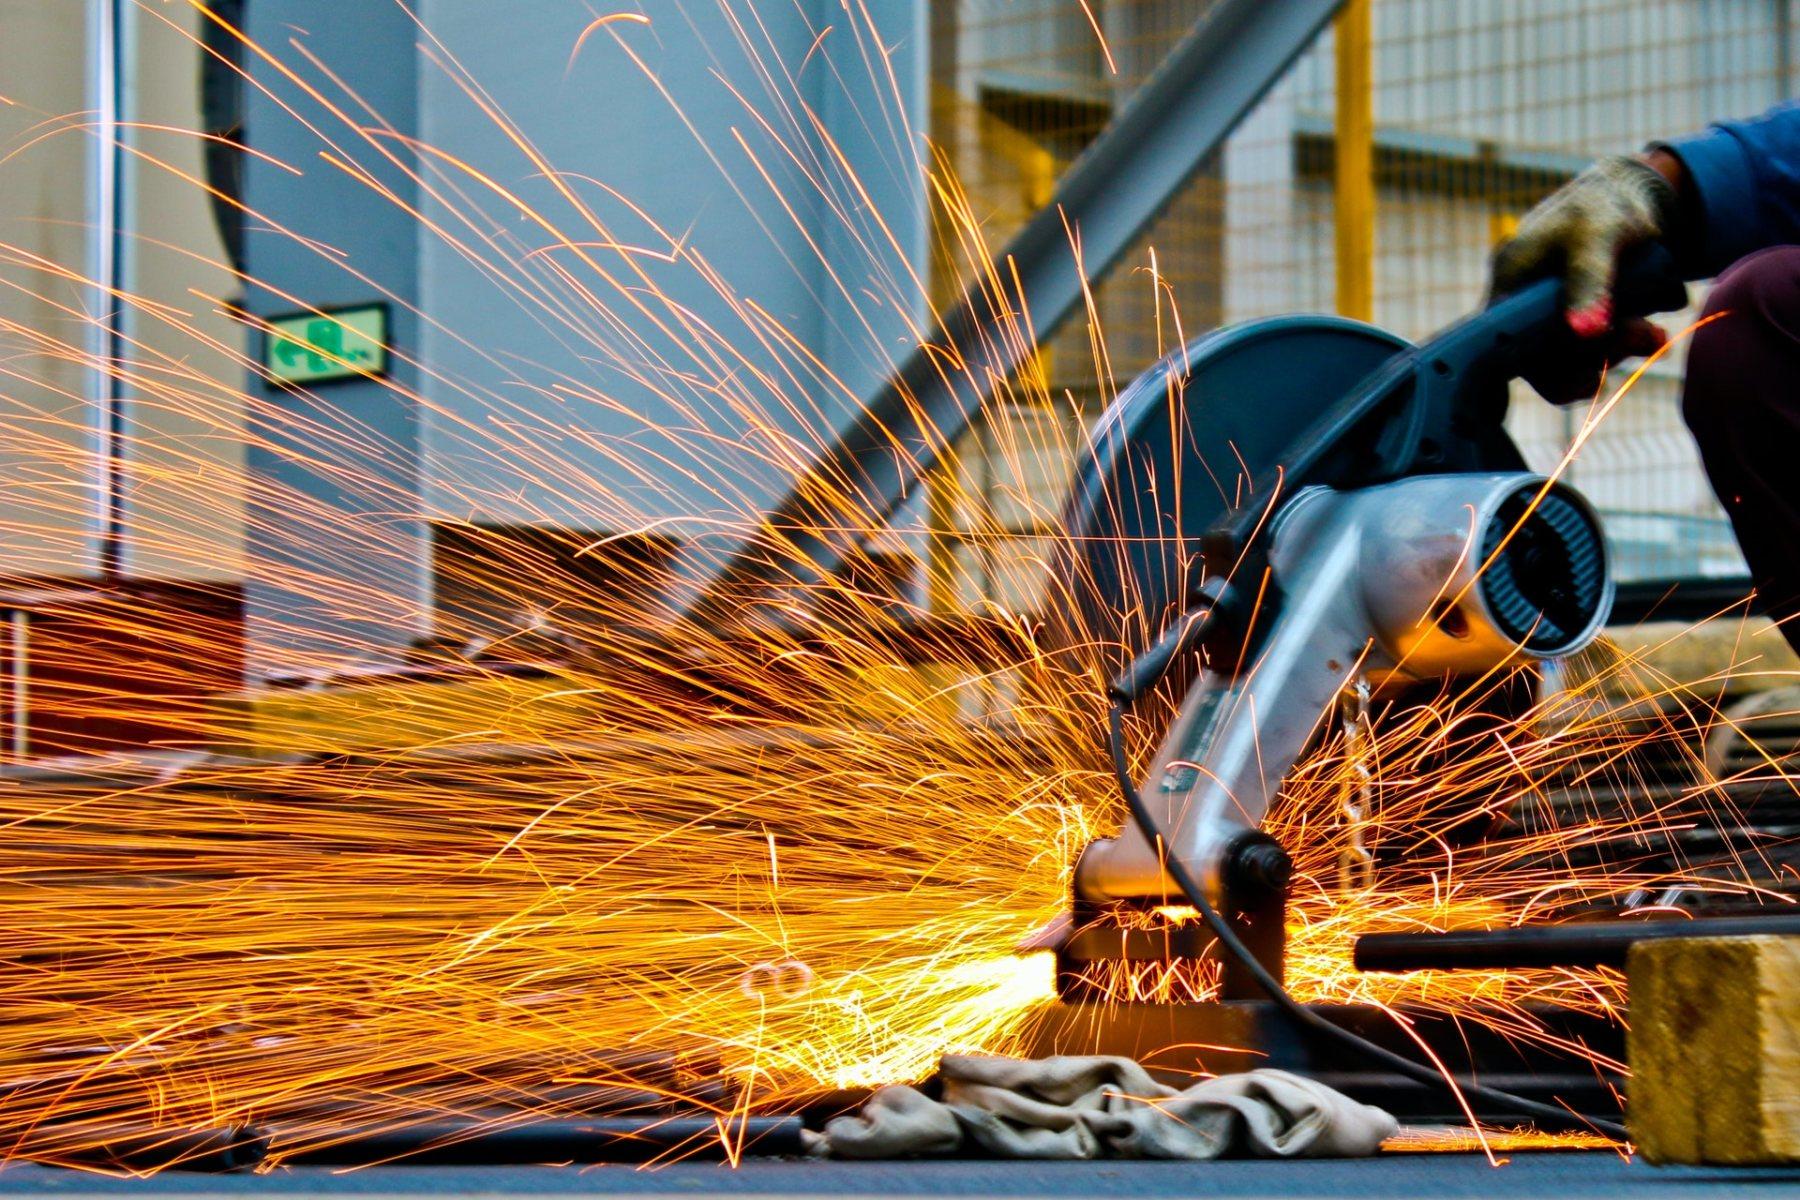 EU Industrial Strategy: DIGITAL SME calls for a stronger focus on digitalisation of SMEs